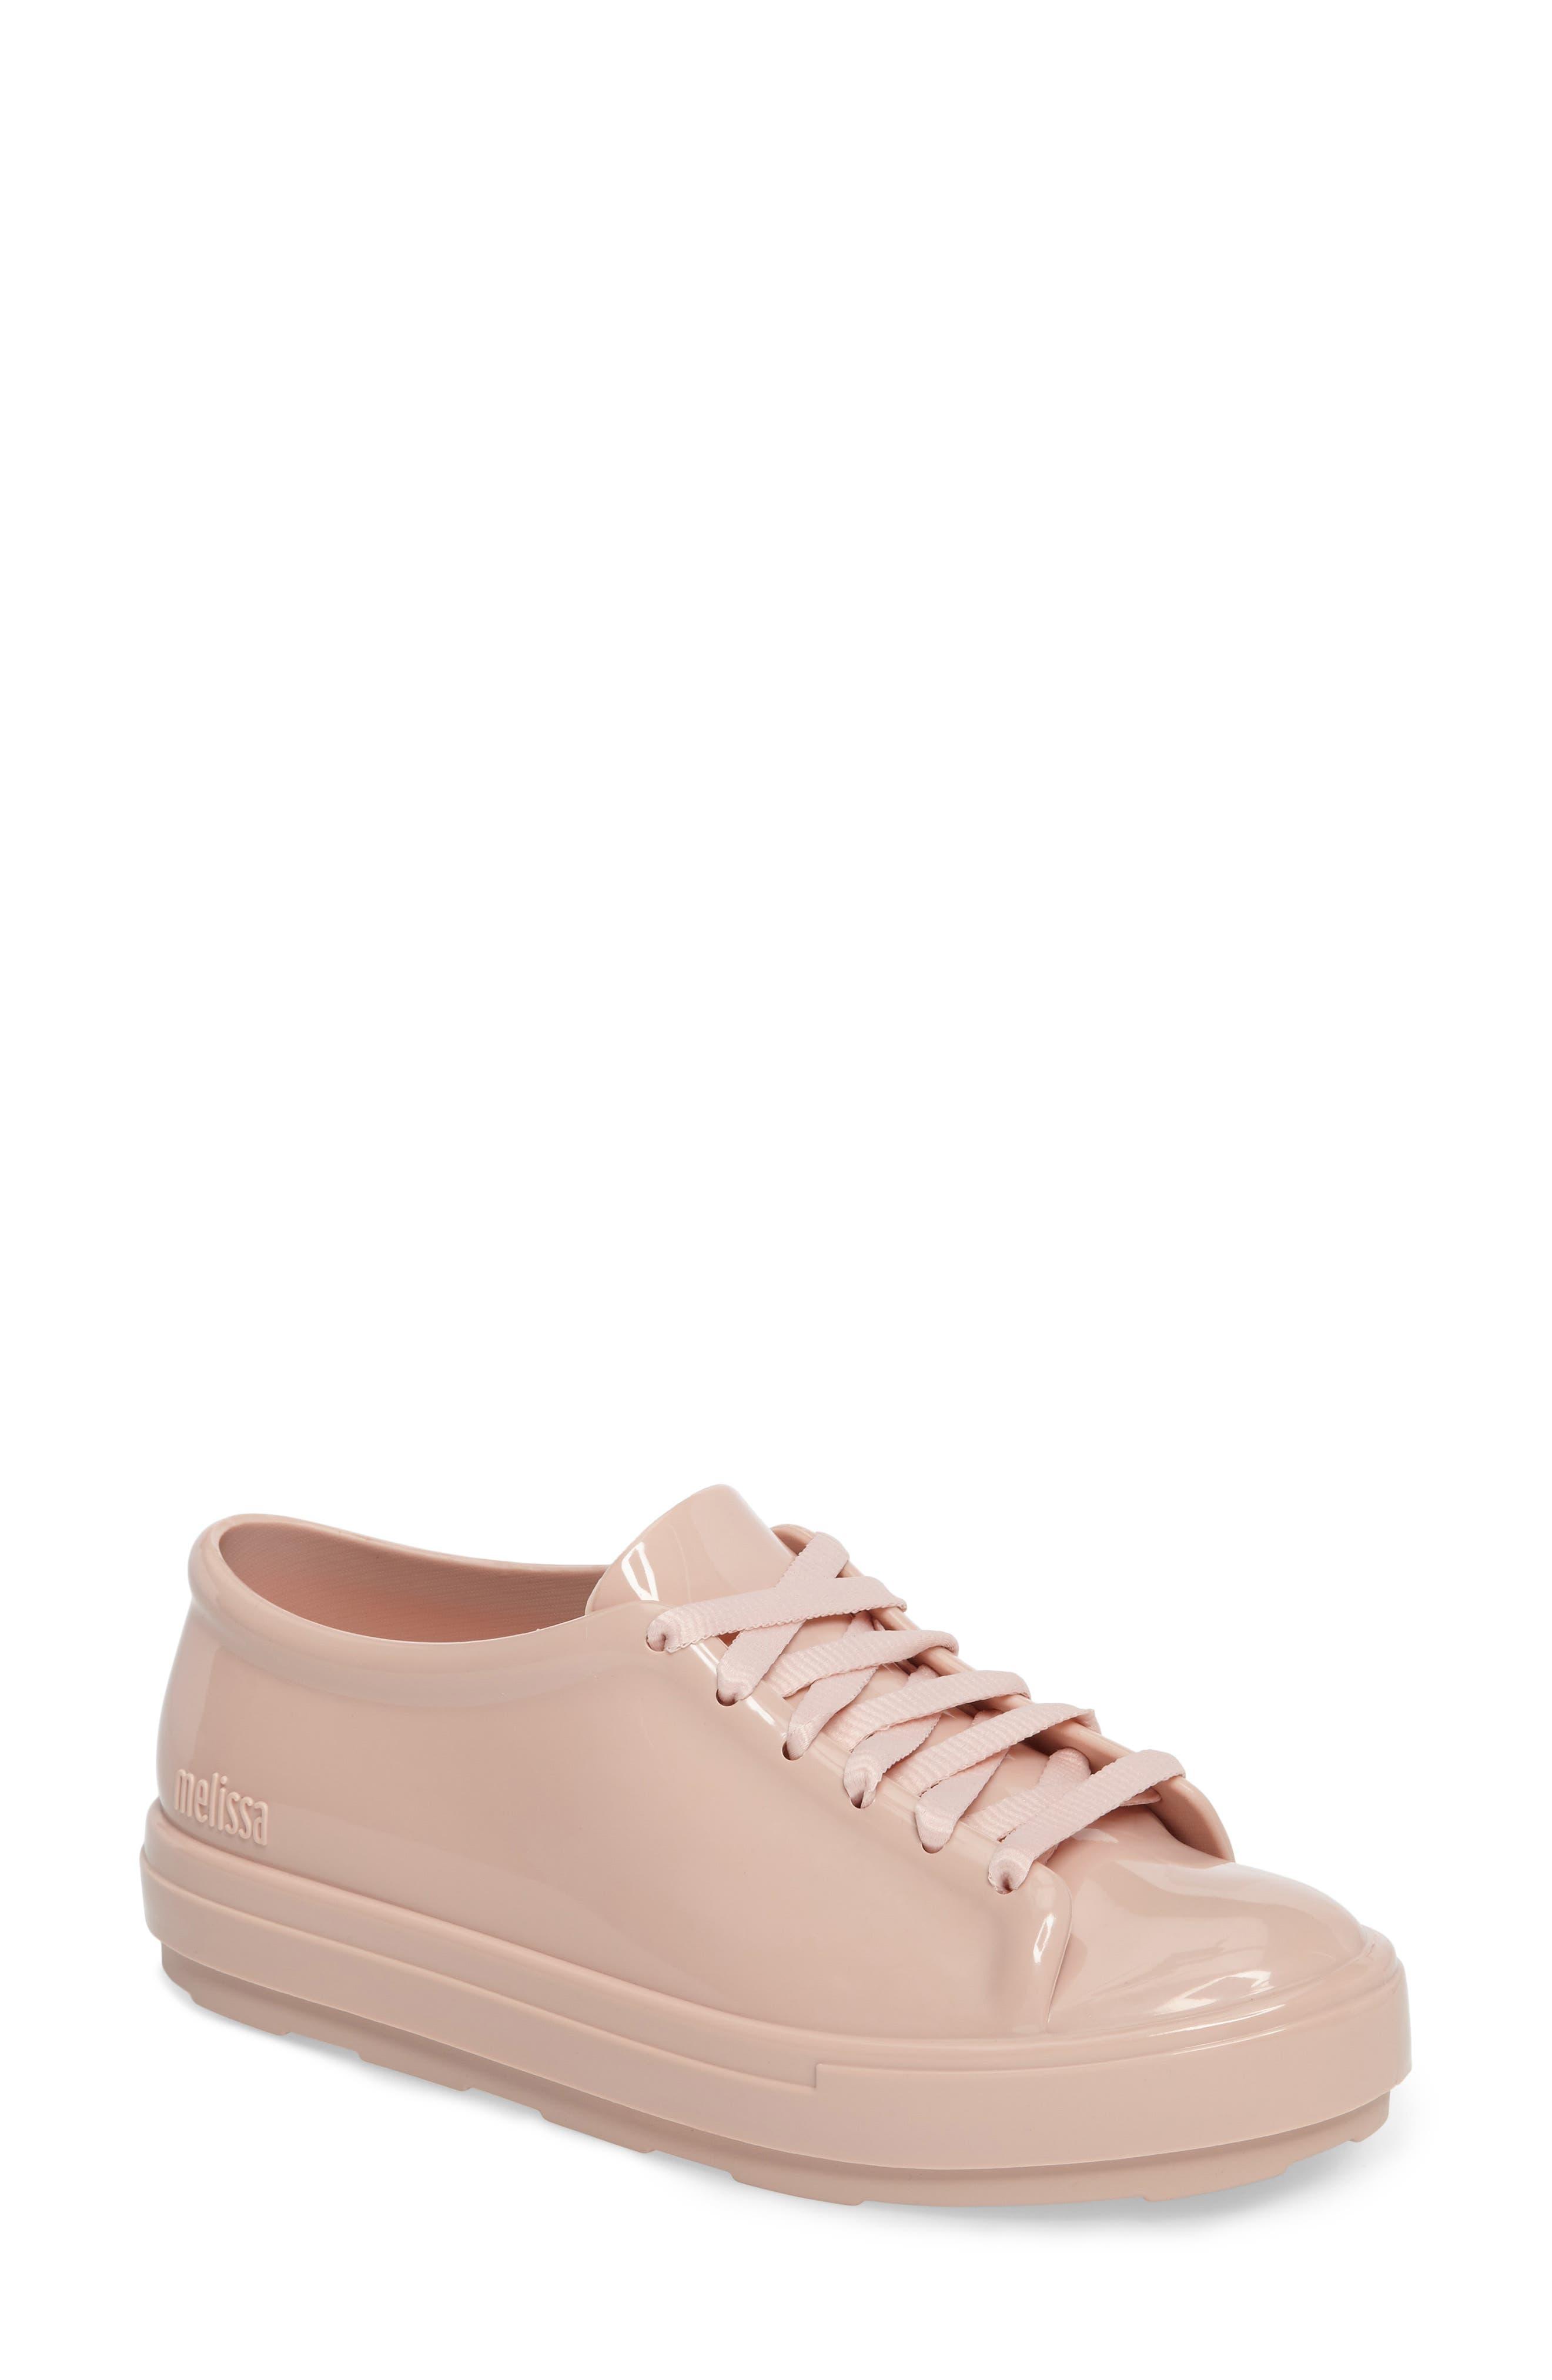 Be Sneaker,                         Main,                         color, Pink